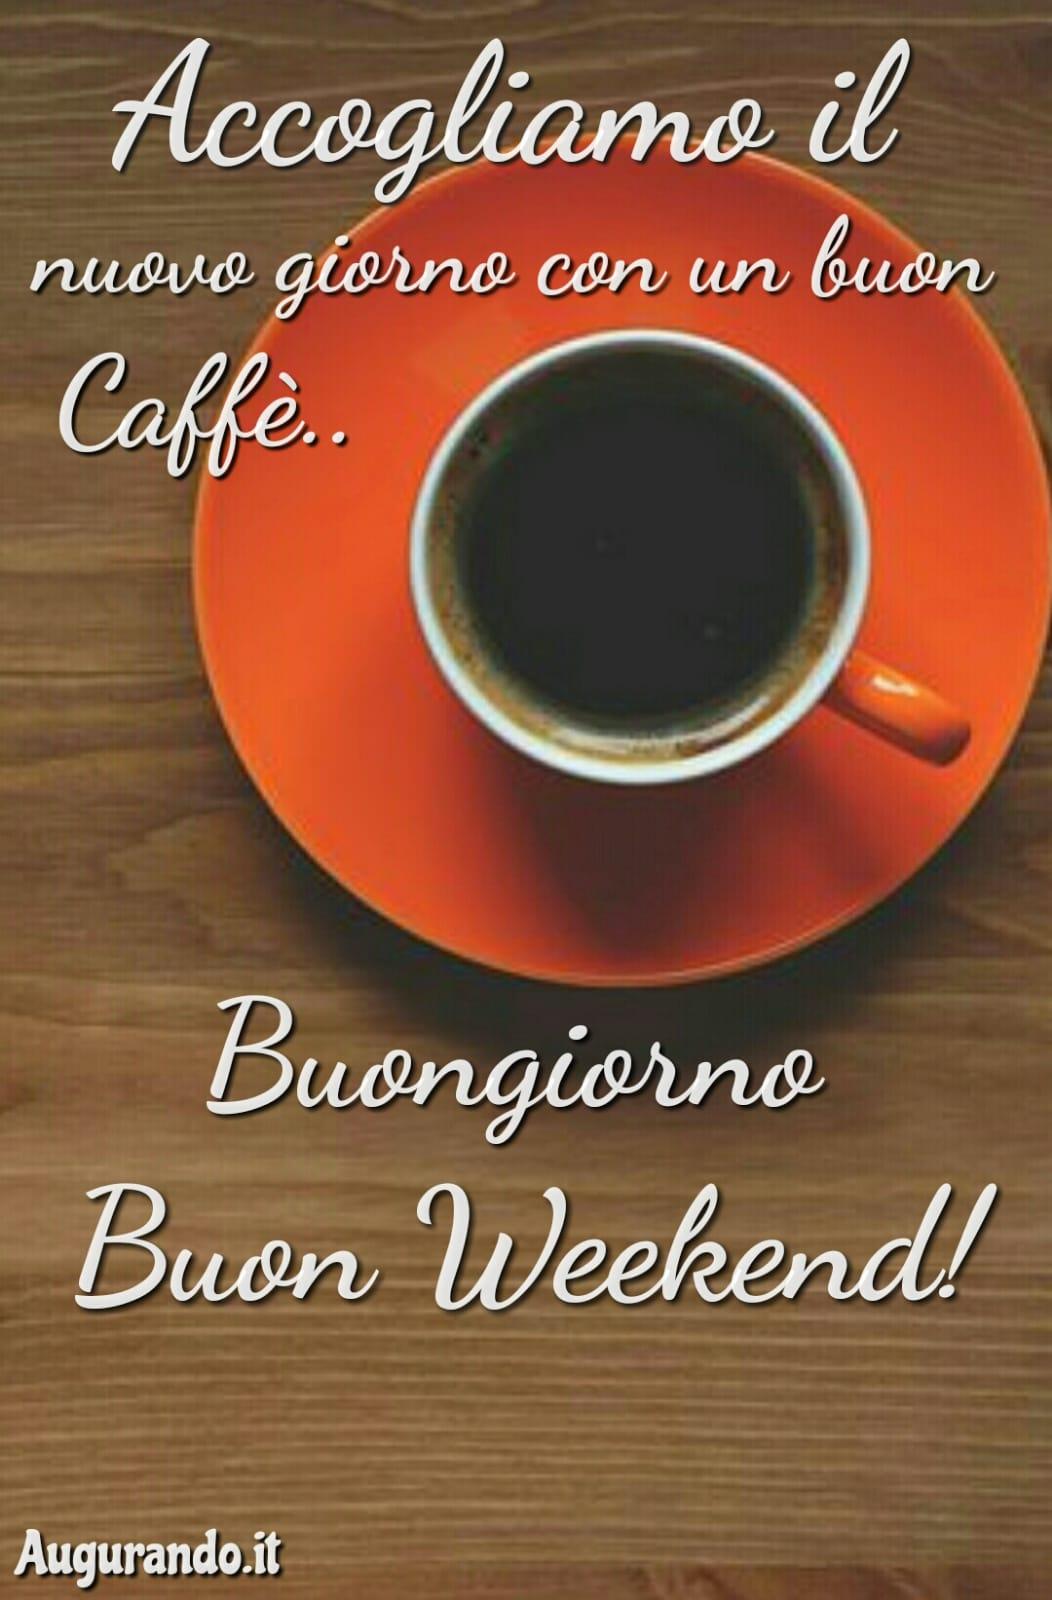 Buon weekend, immagini weekend, sereno fine settimana, sereno weekend, buon weekend a tutti, weekend, buon weekend a te